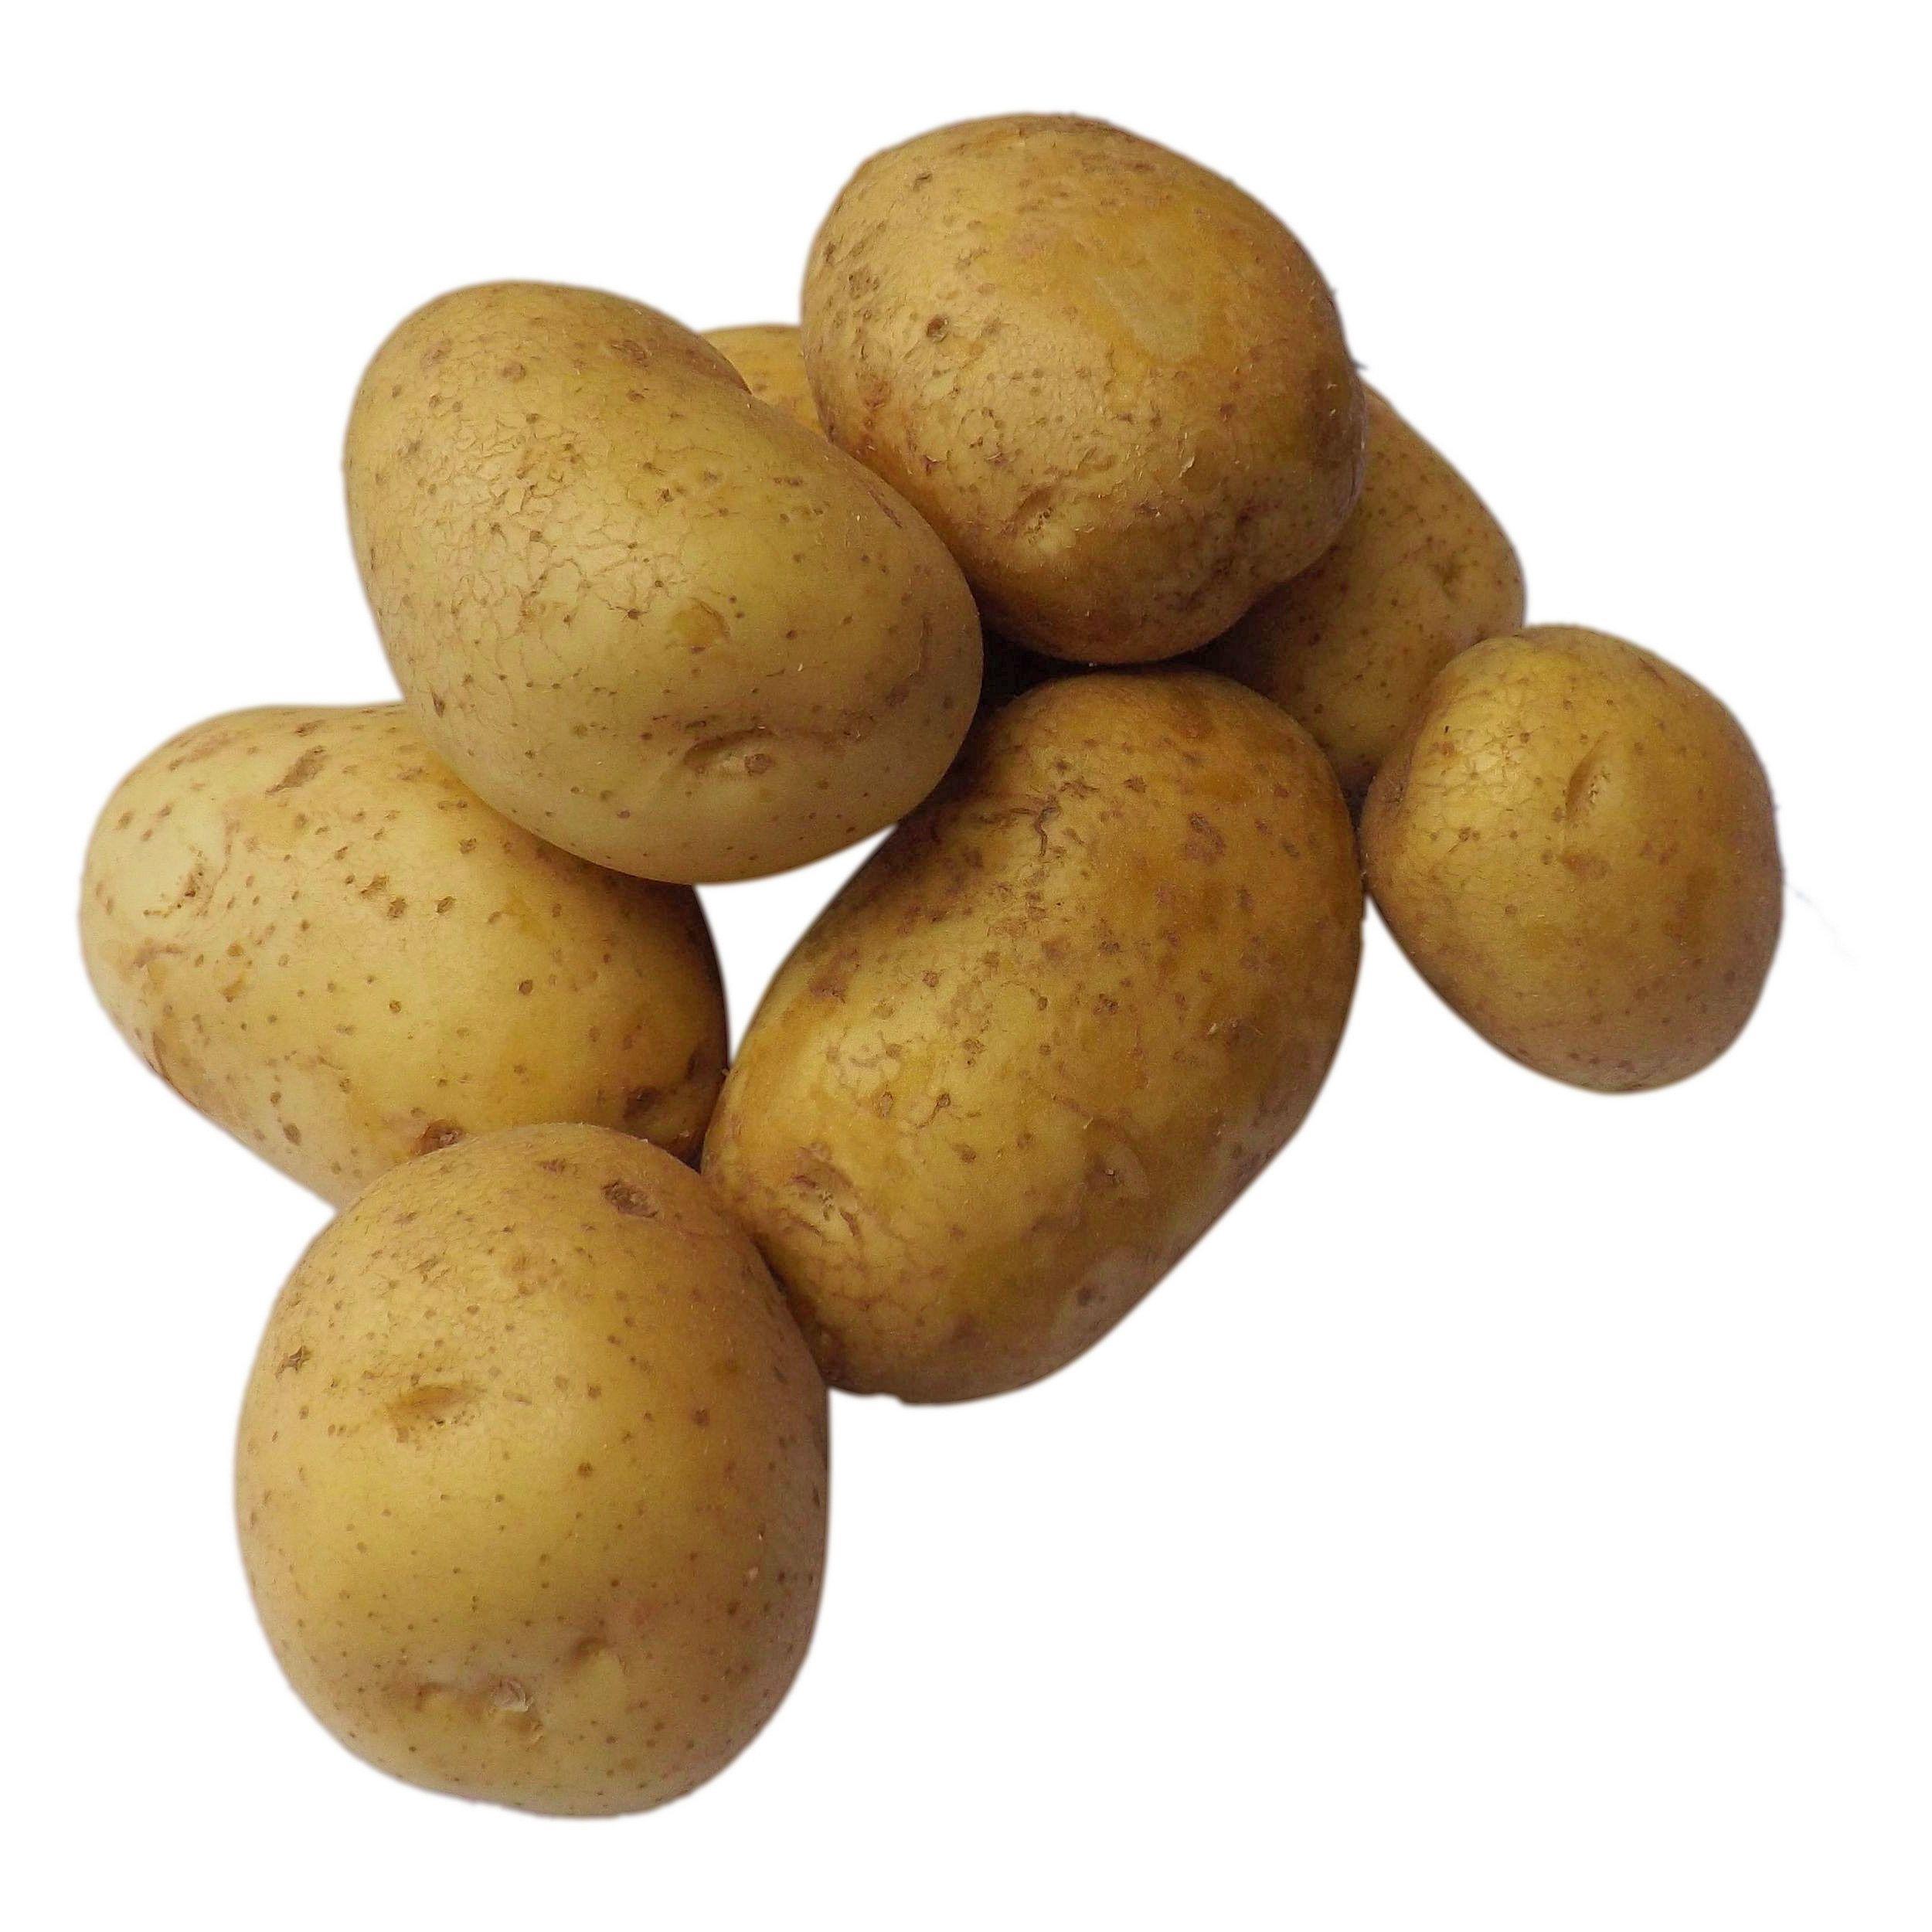 is potato a root